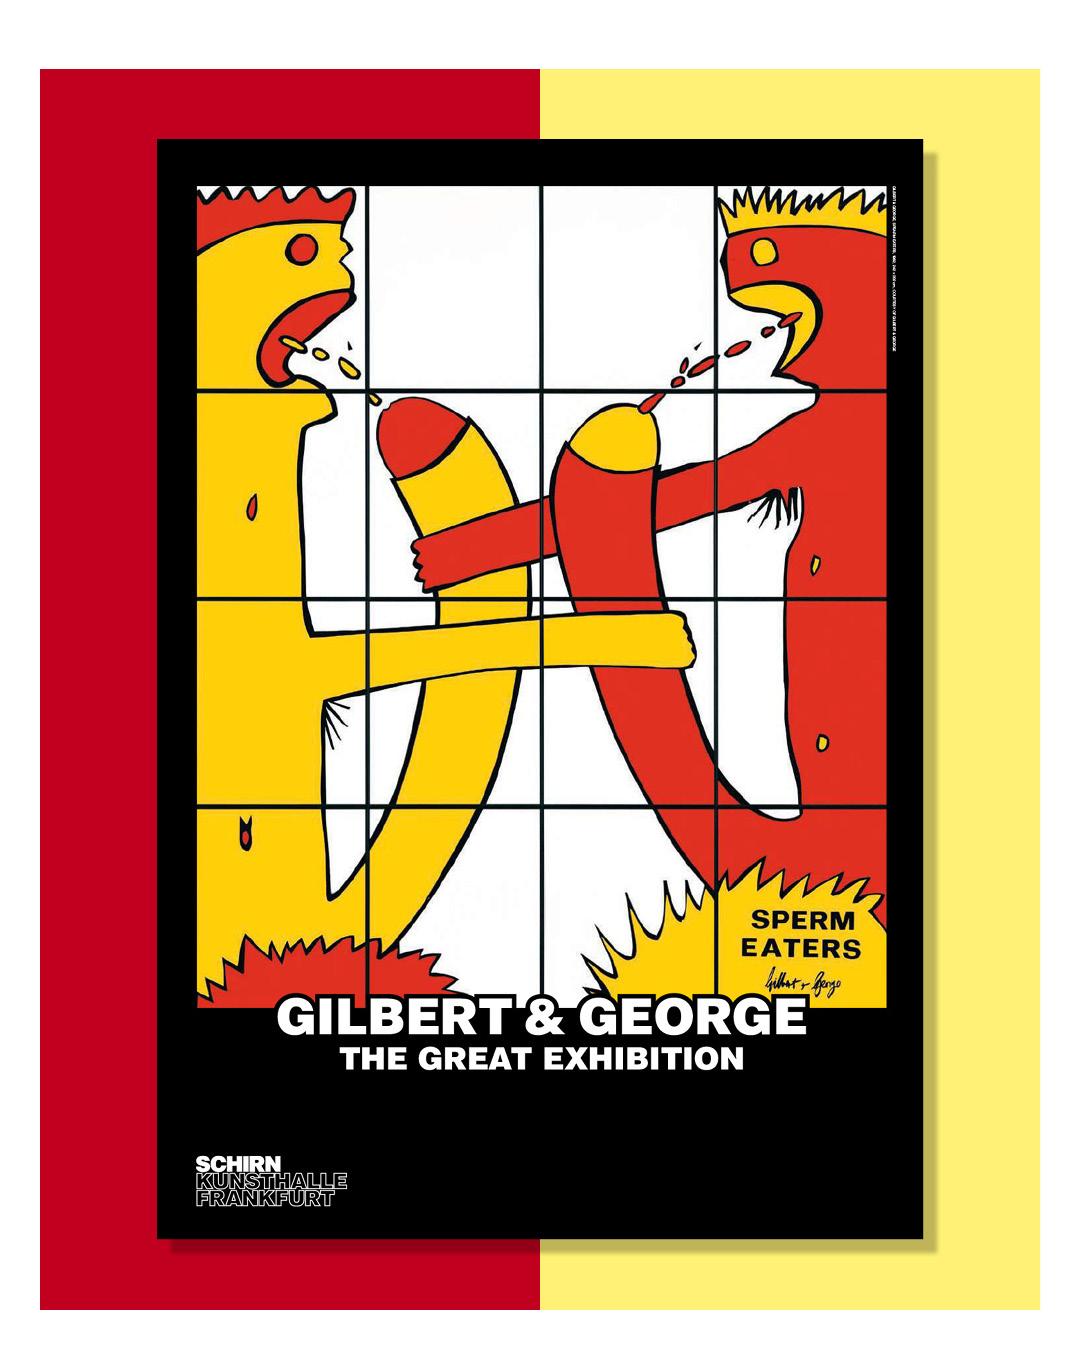 KUNSTDRUCK GILBERT & GEORGE, SPERM EATERS, 1982